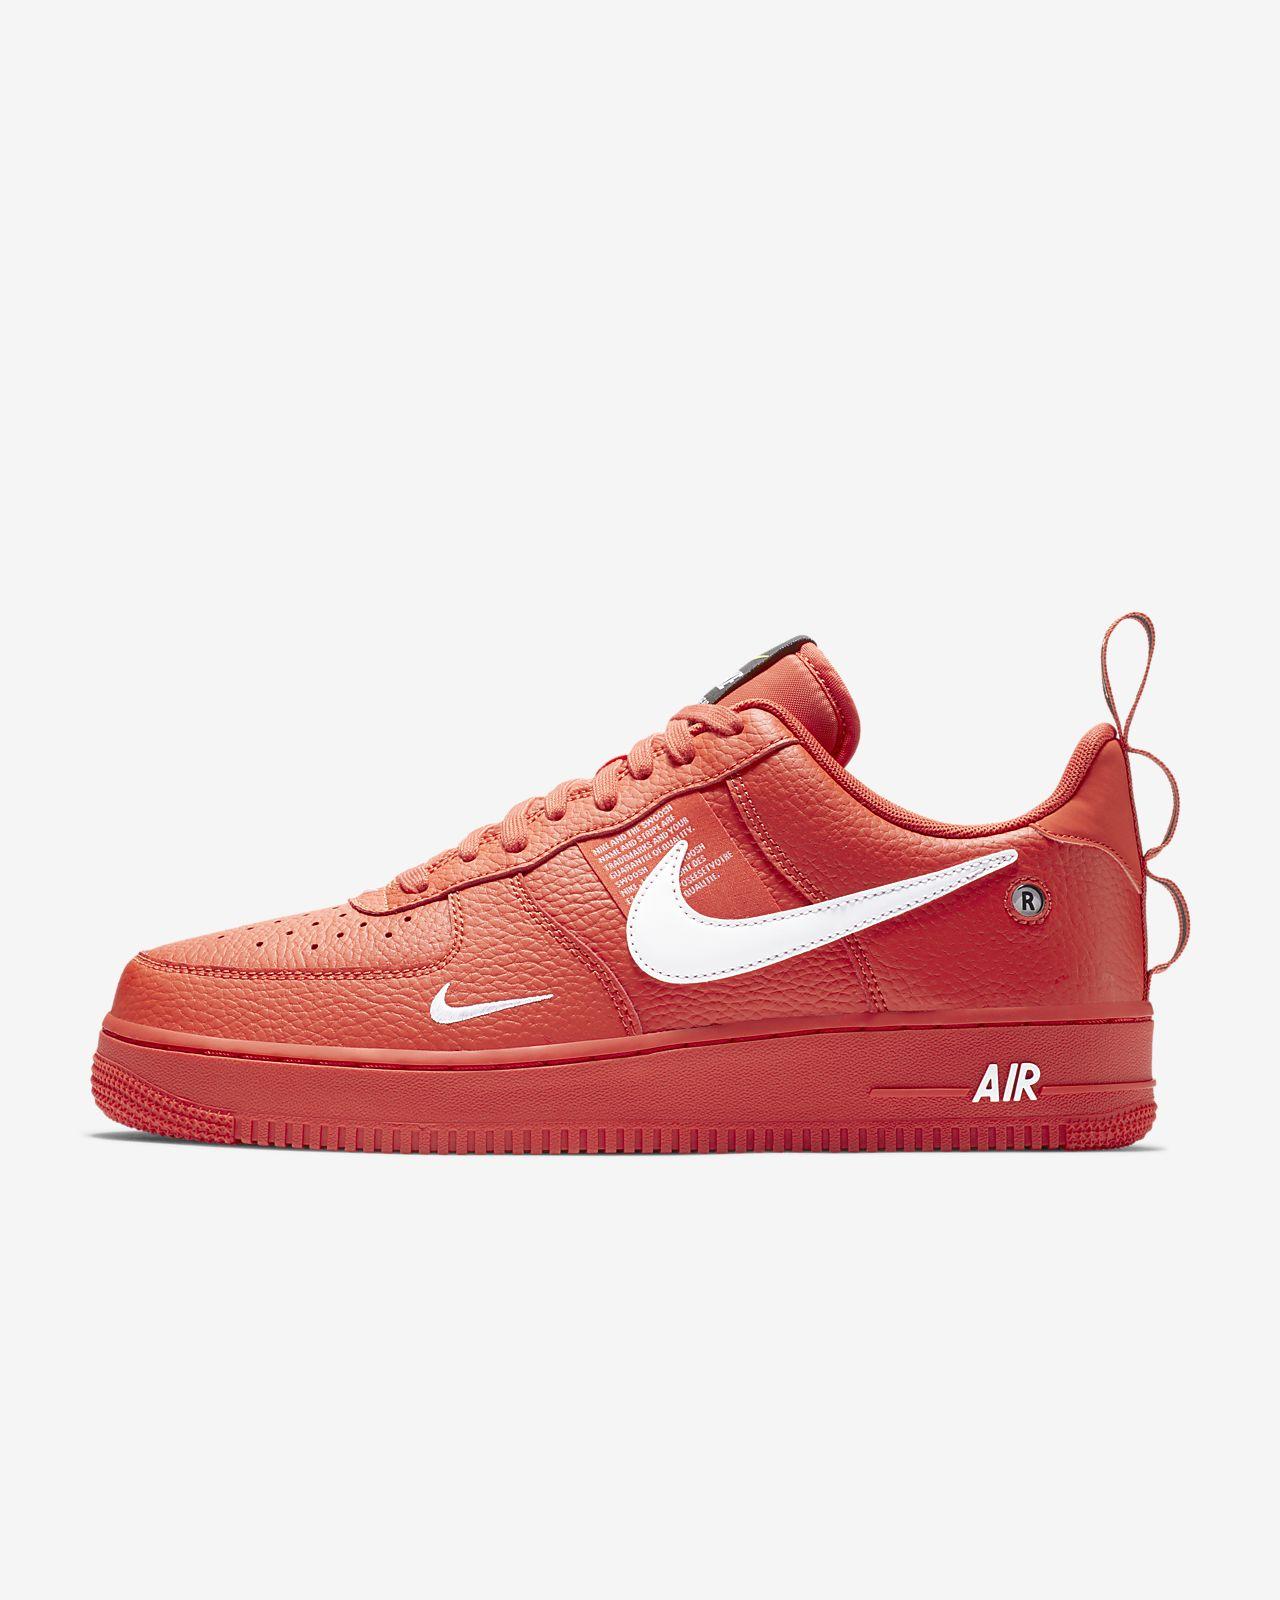 quality design bb7fc b906f ... Nike Air Force 1 07 LV8 Utility-sko til mænd